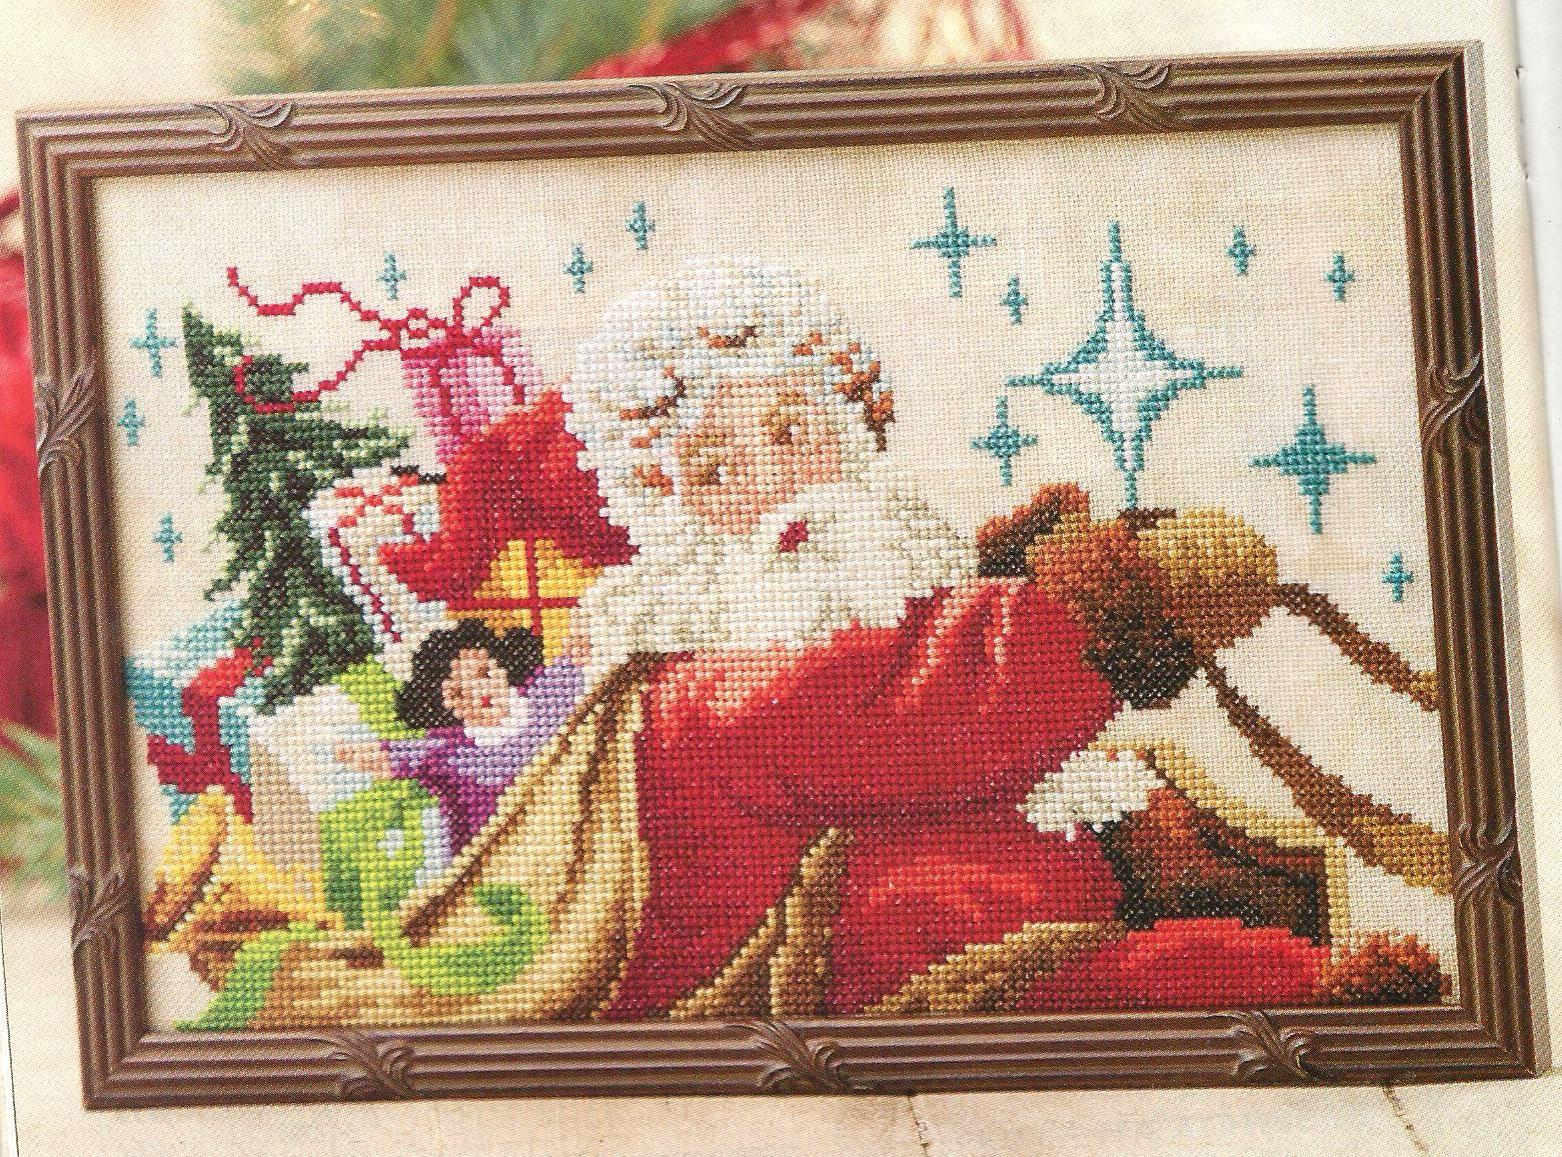 Santa's Sleigh Ride - Marie Barber (designer) - stitch count 139w x 83h